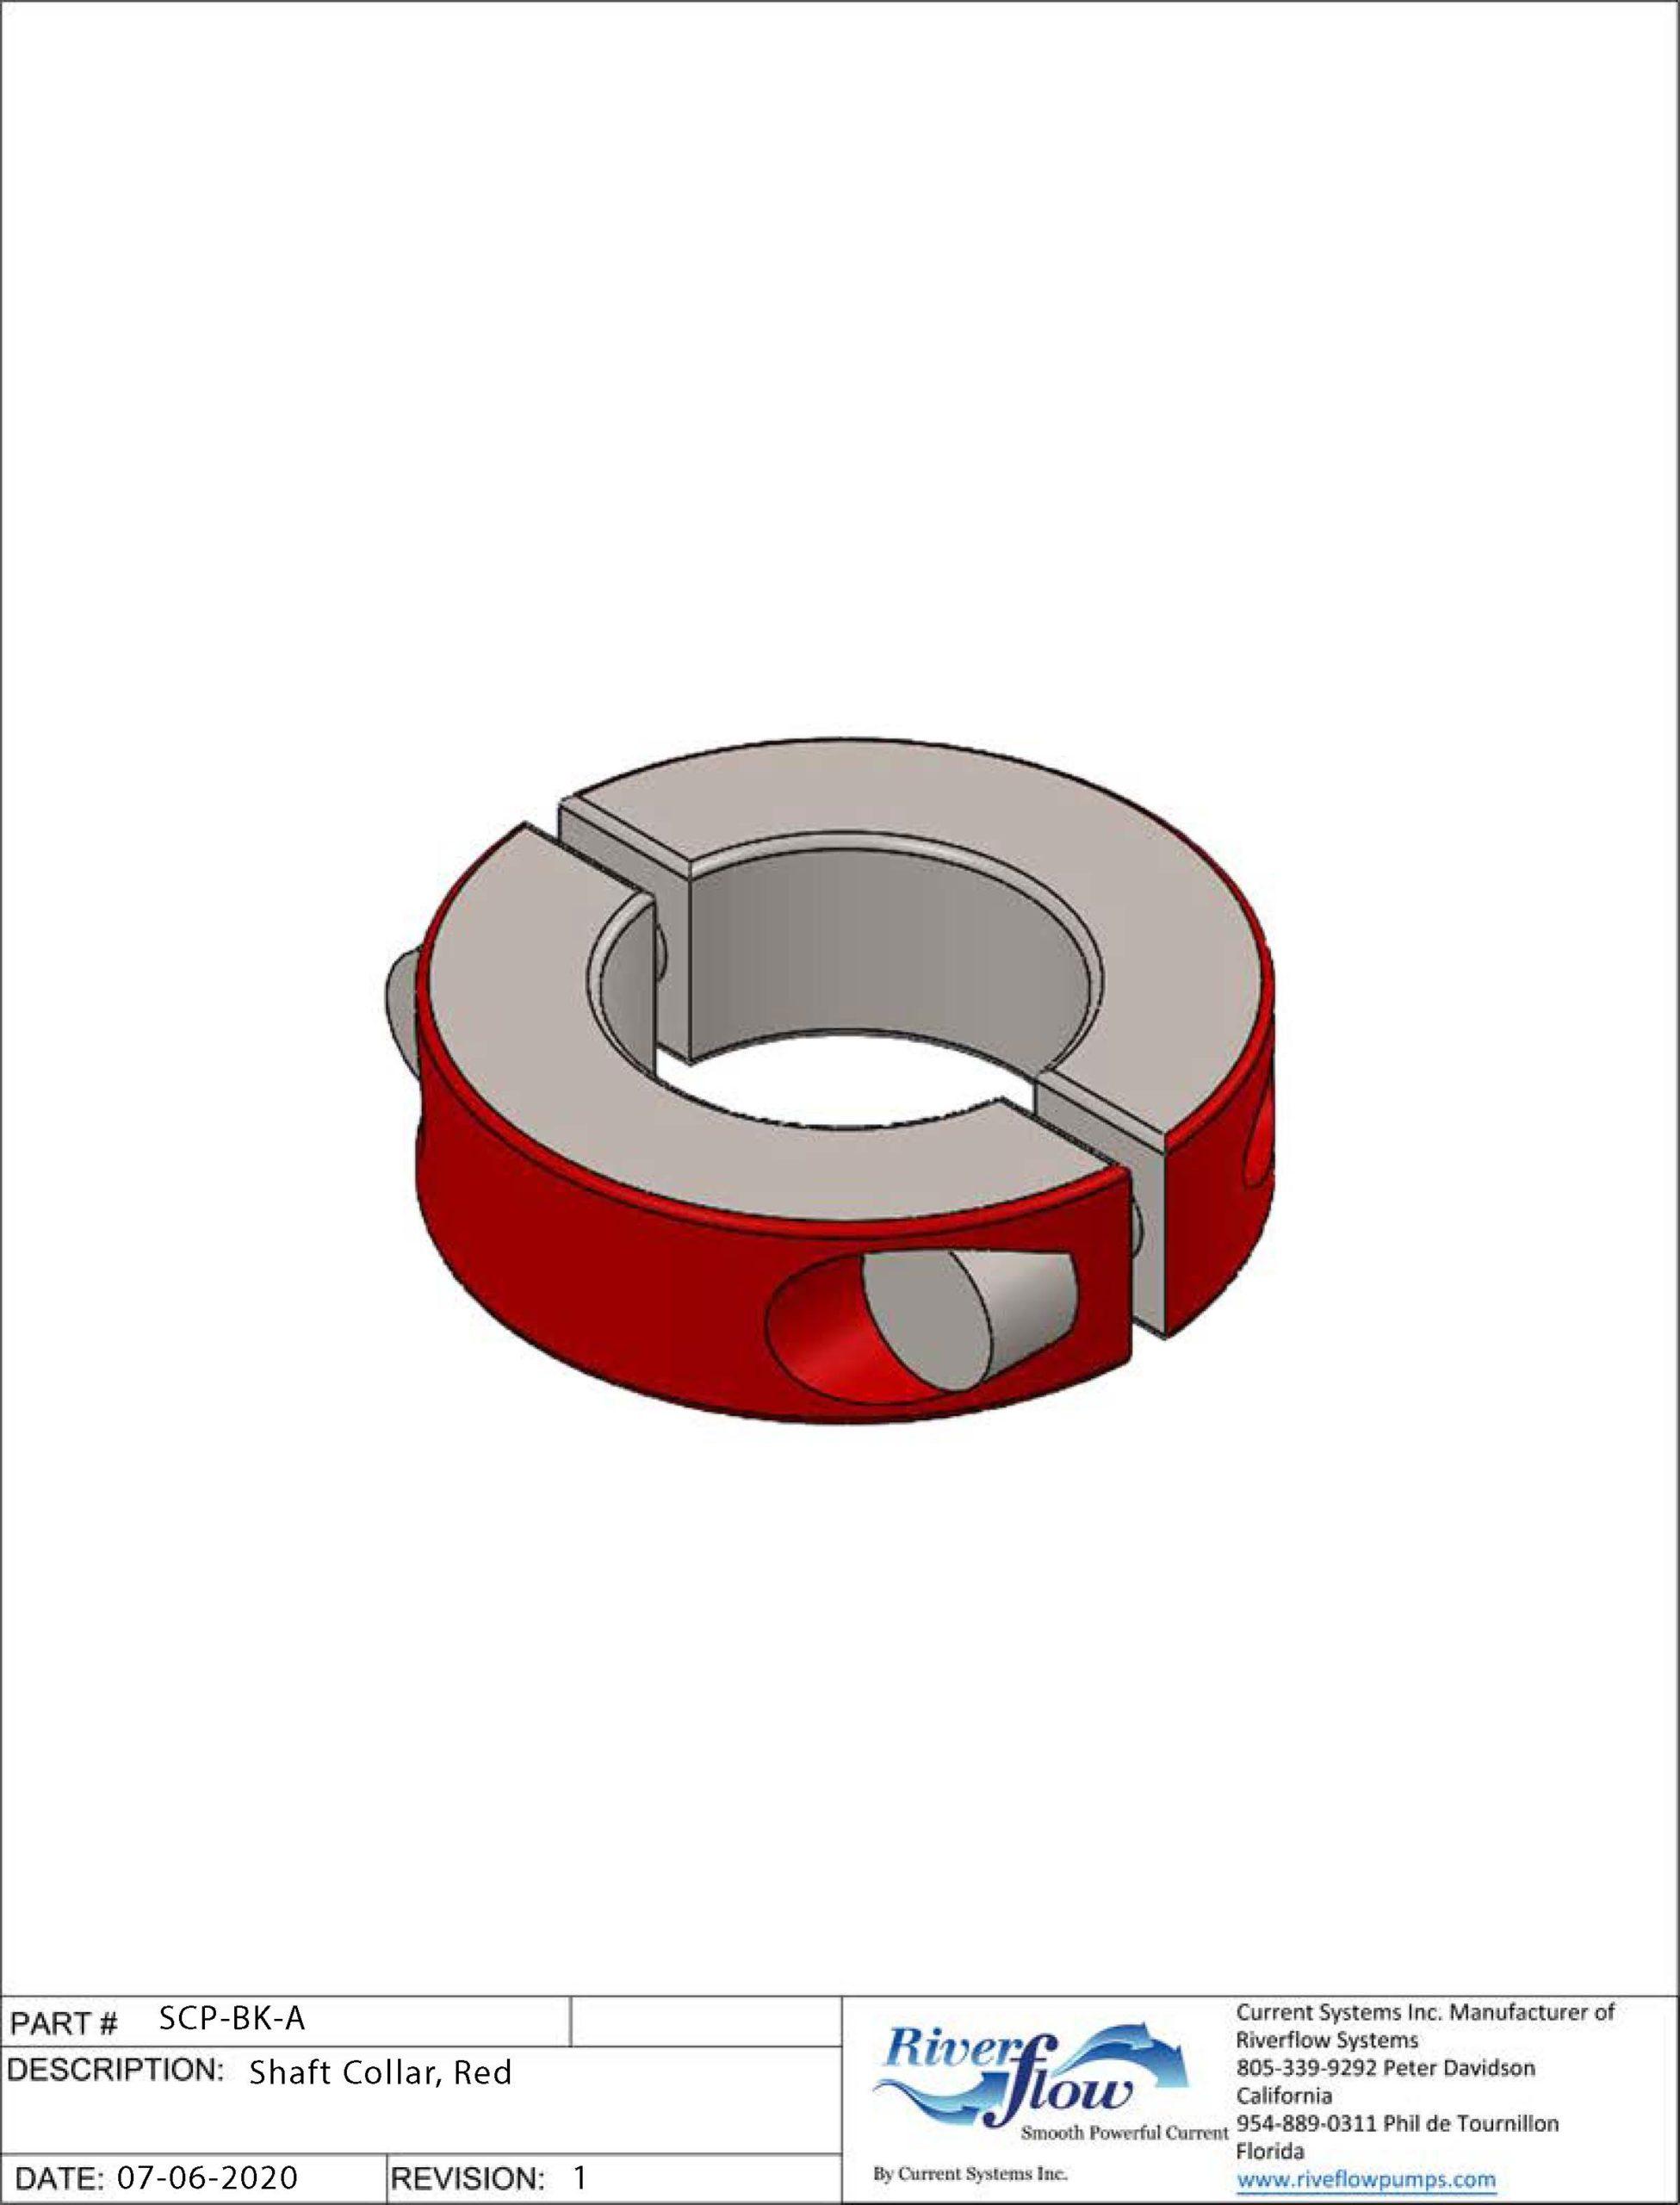 PN#: 2C-100-Z  Shaft Collar, Red